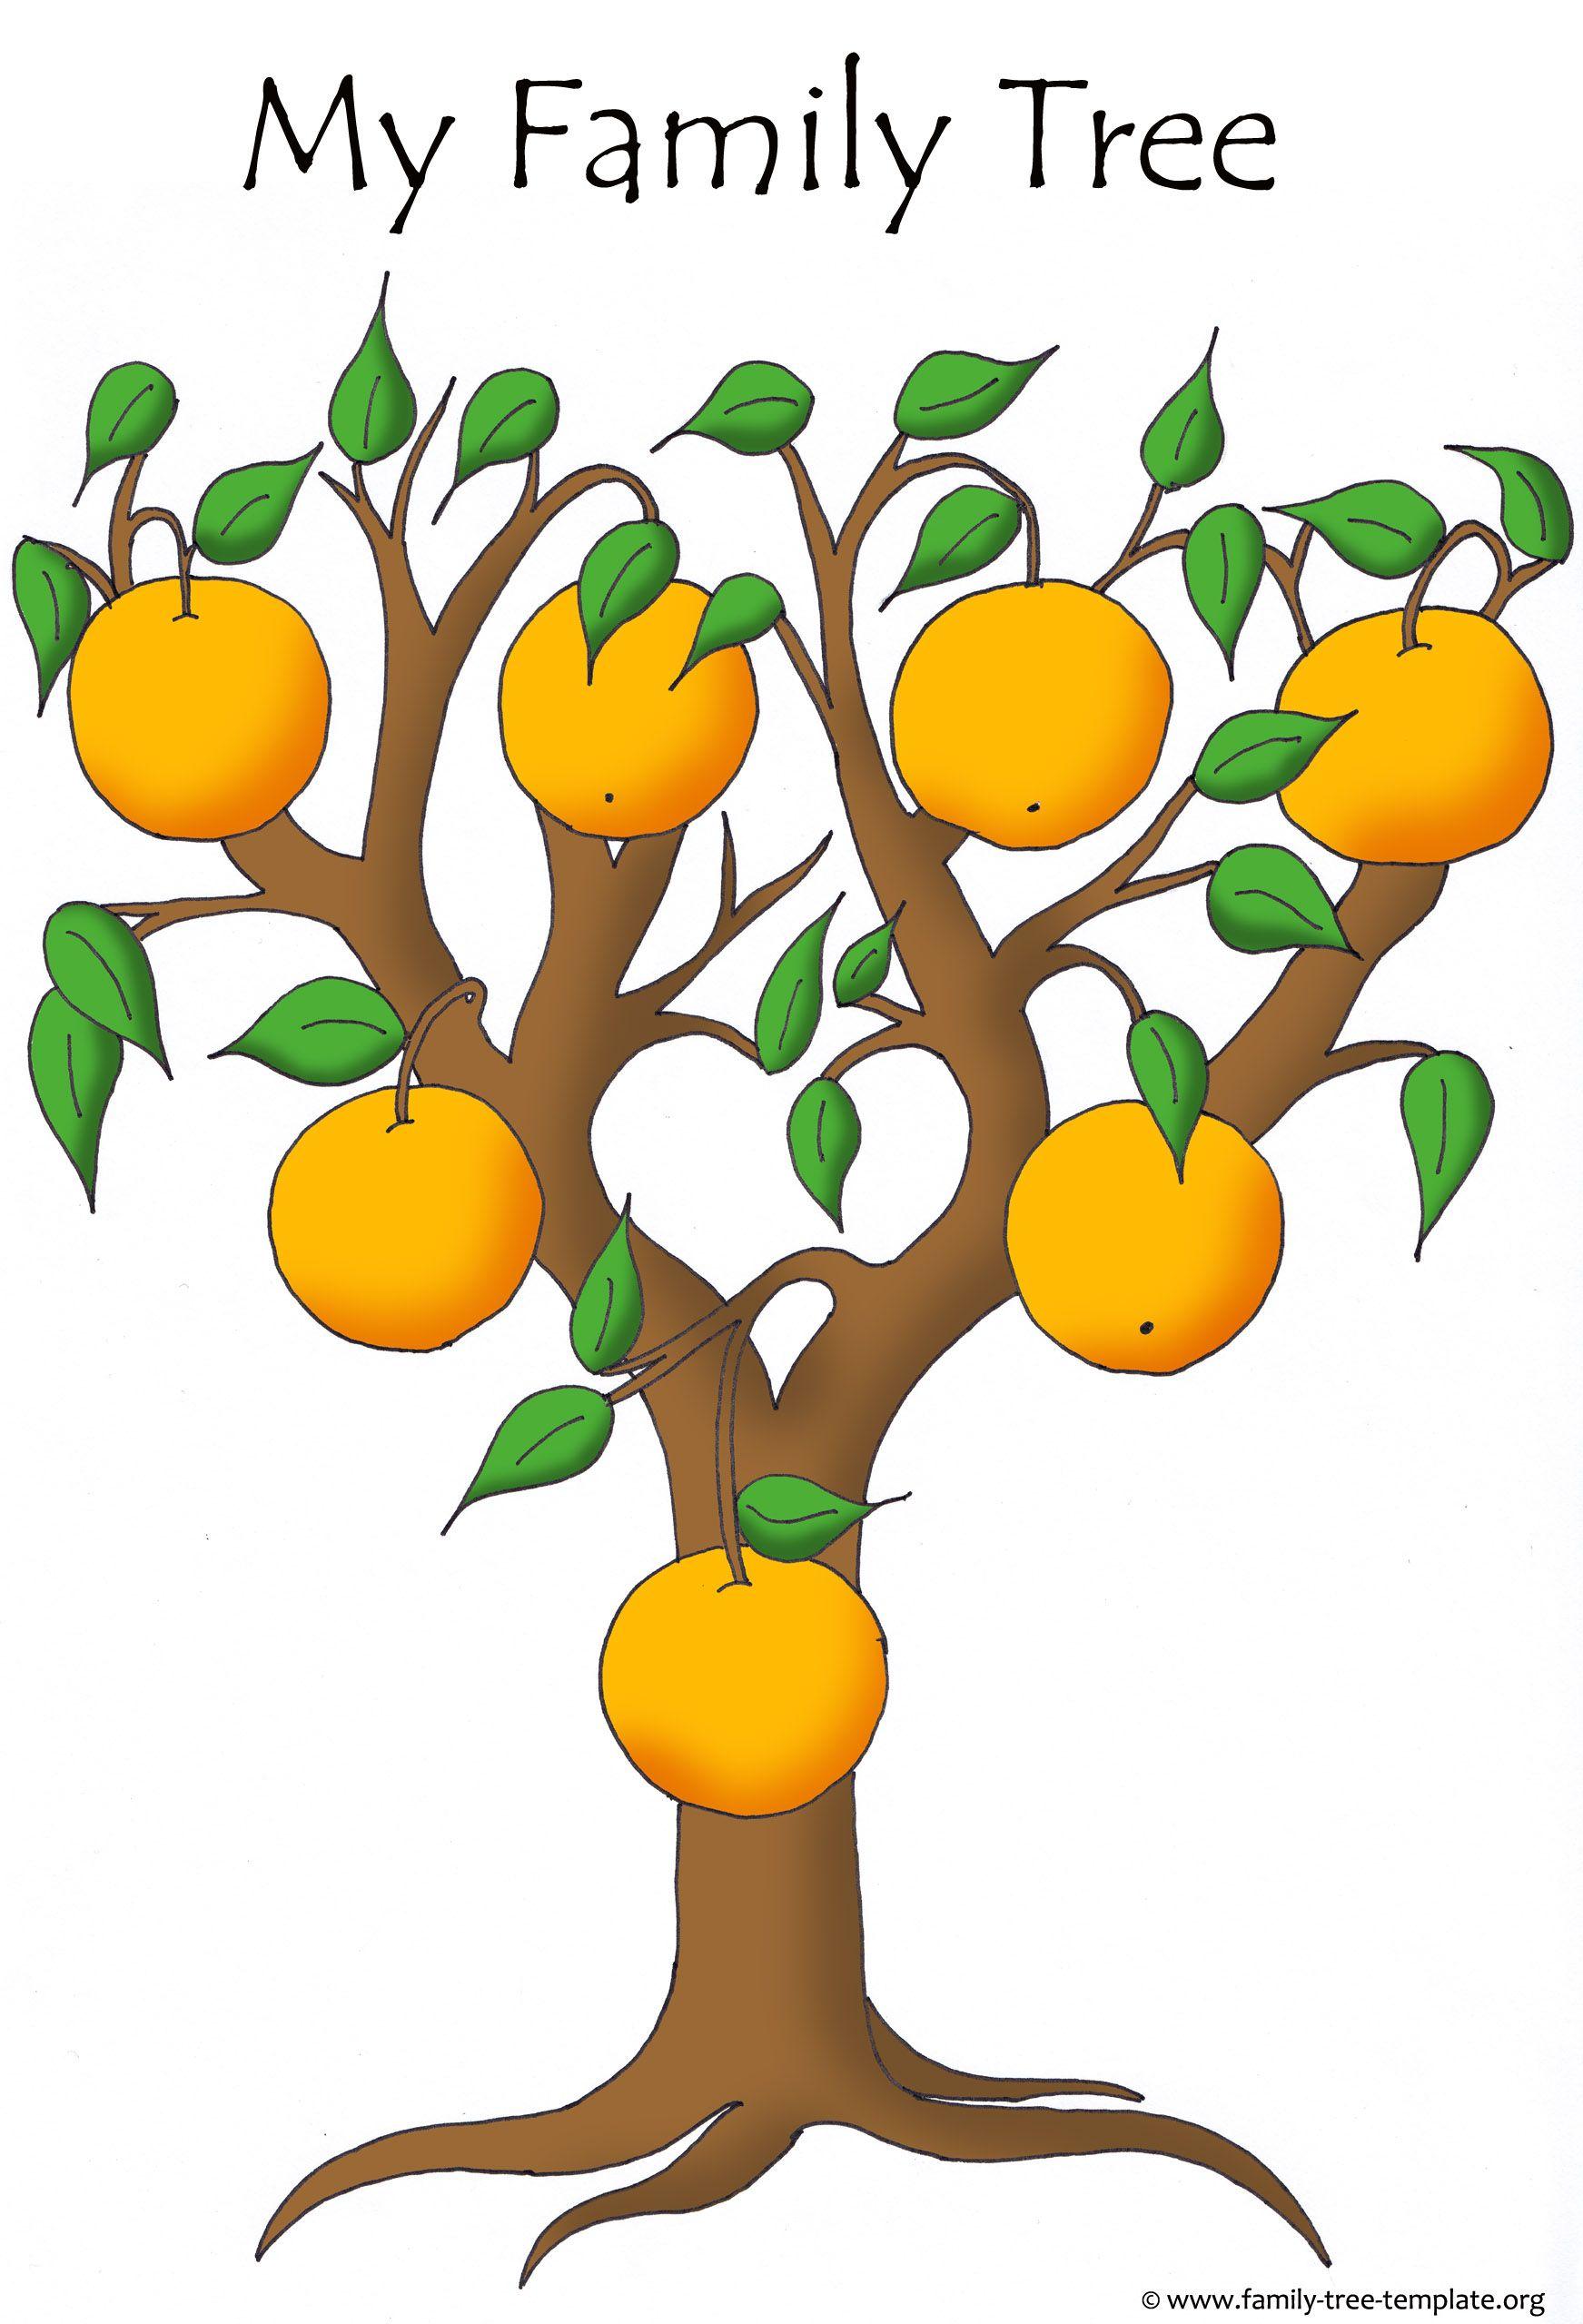 Easy Family Tree To Fill Out For Smaller Children Orange